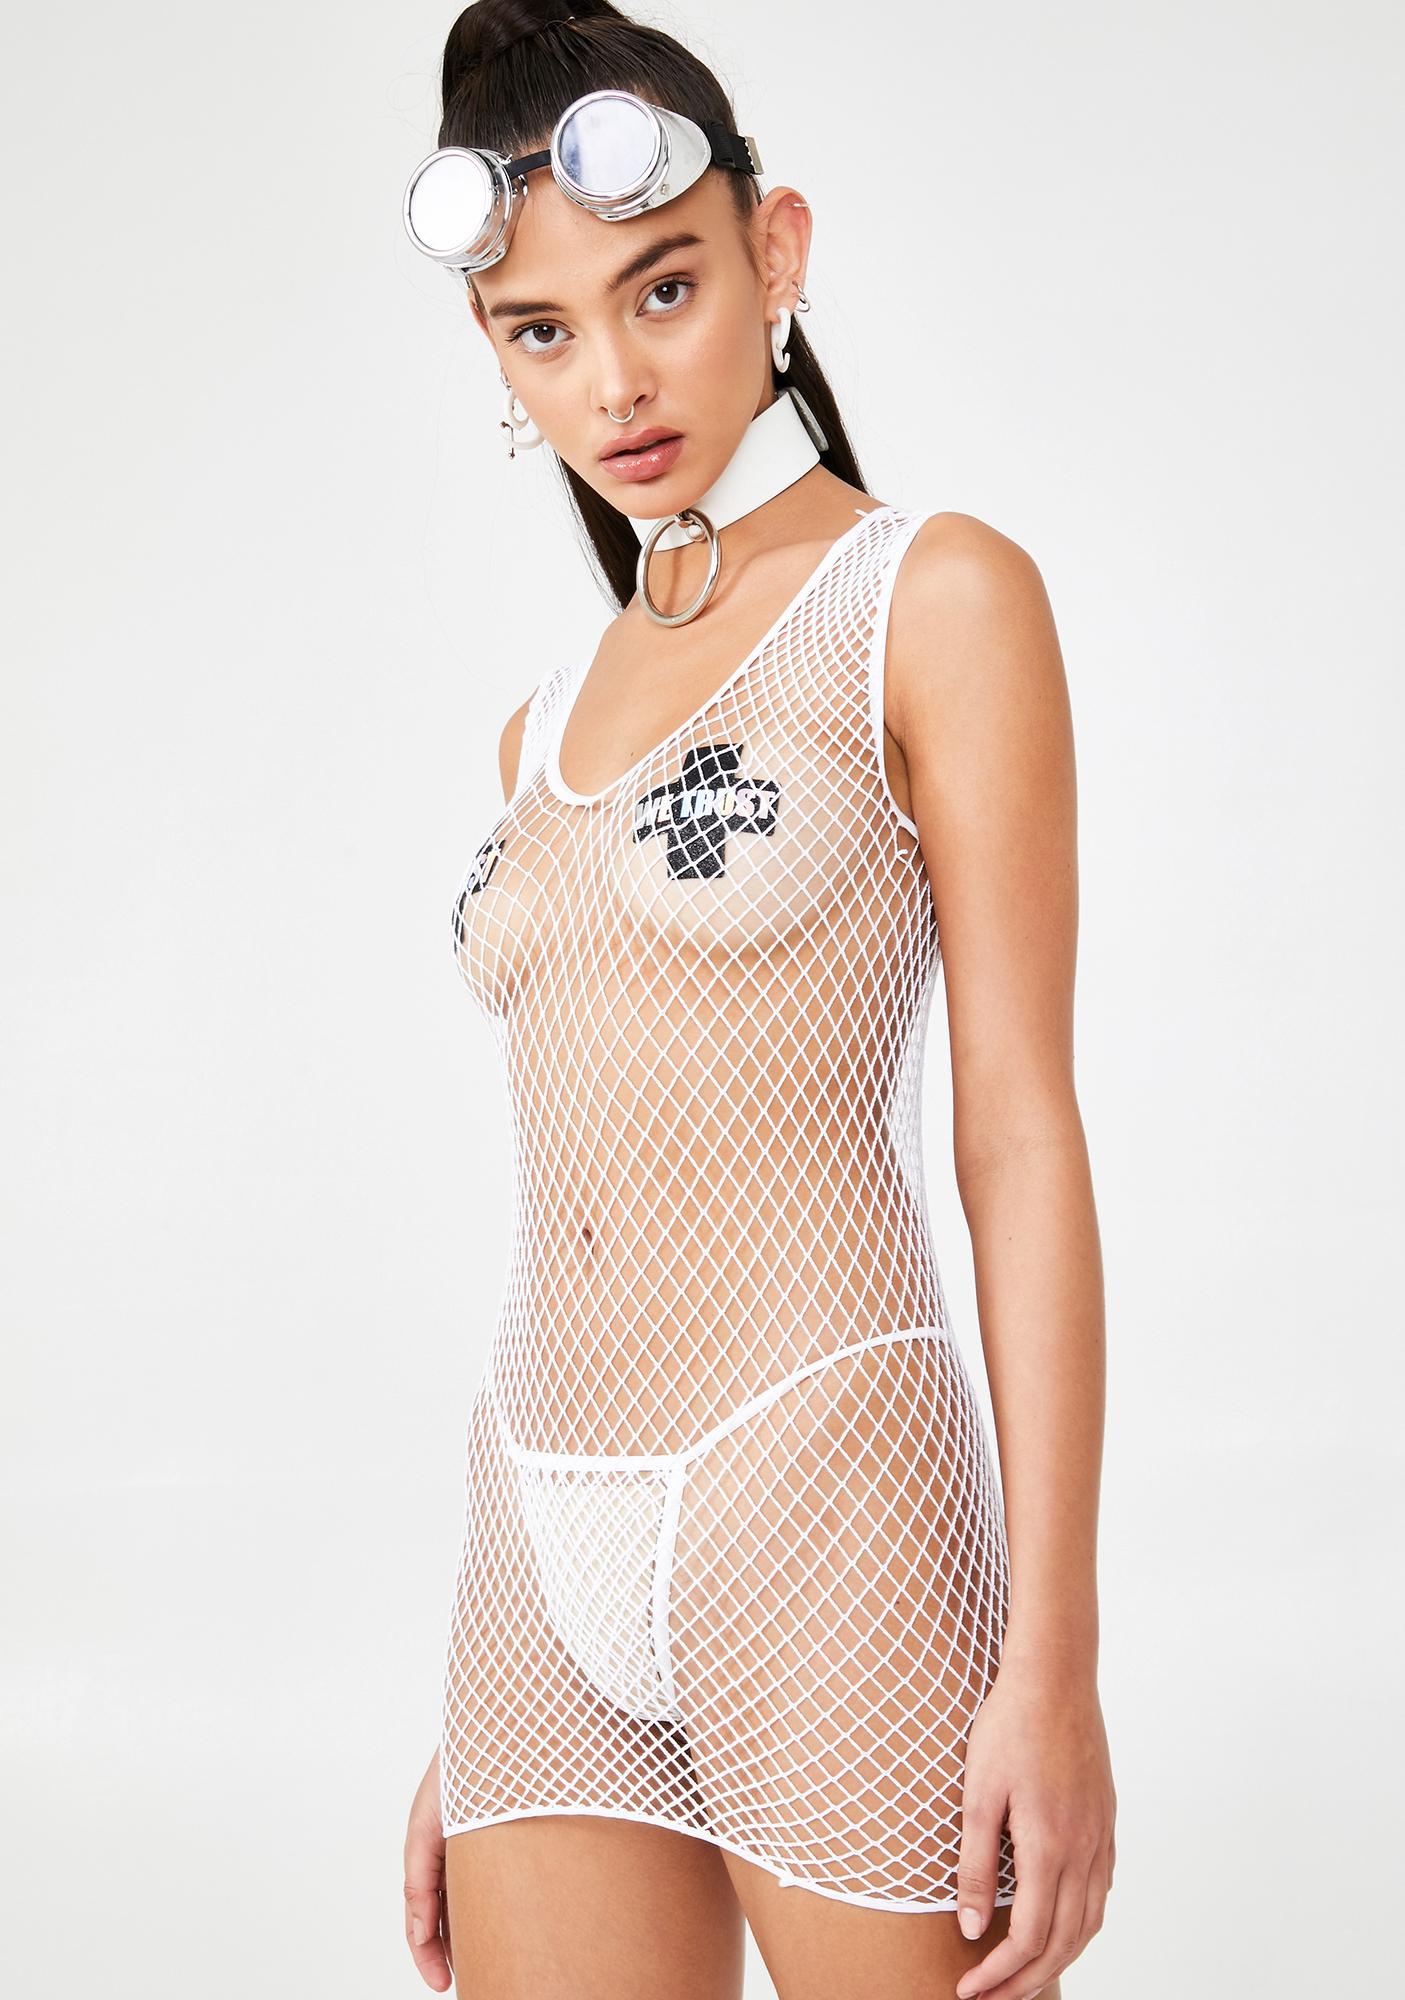 Boo Up All Night Fishnet Set